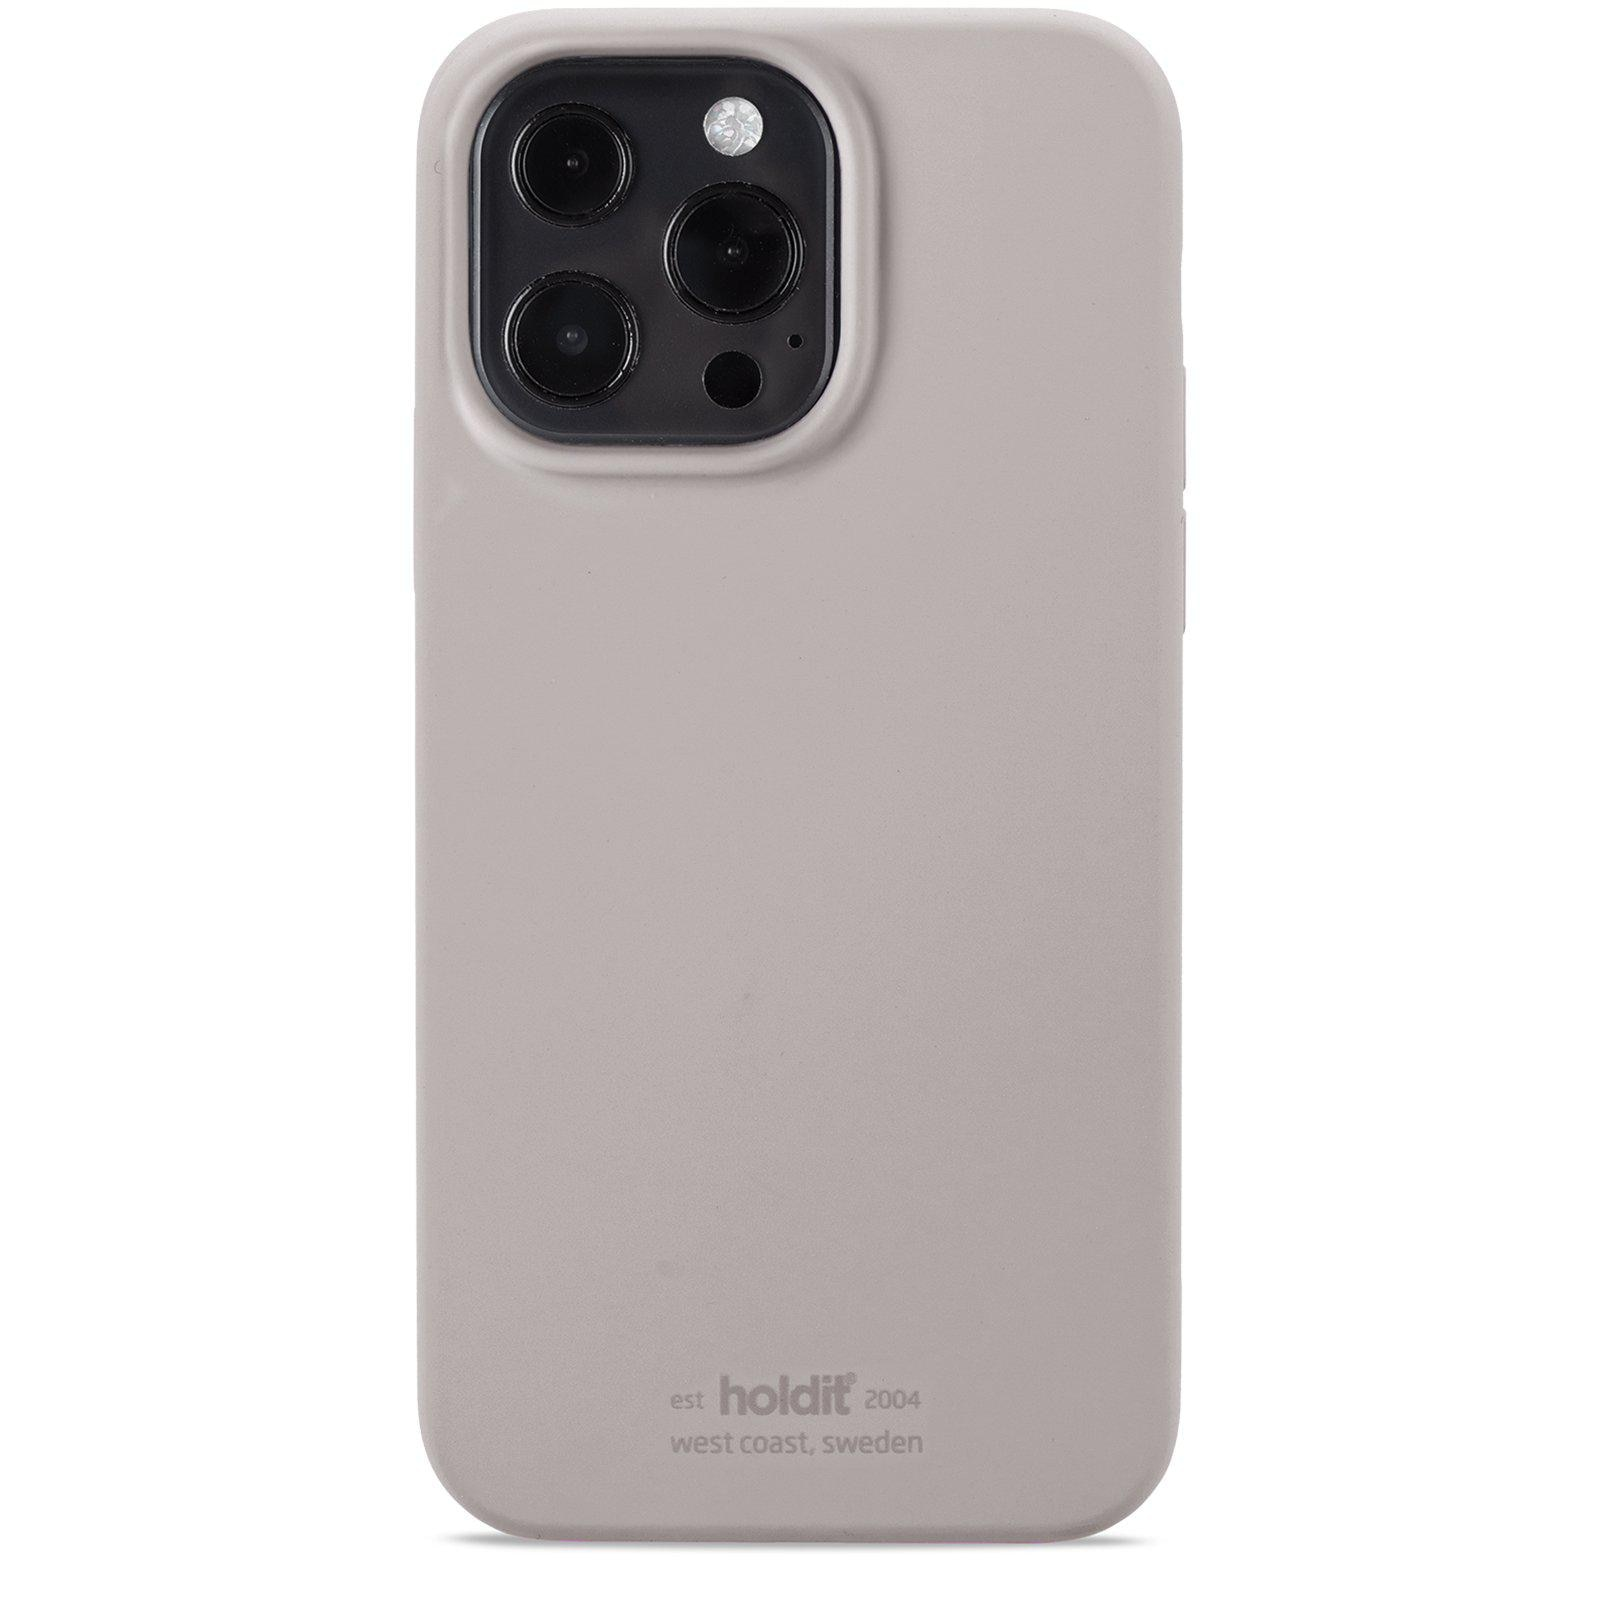 Silikonskal iPhone 13 Pro Taupe